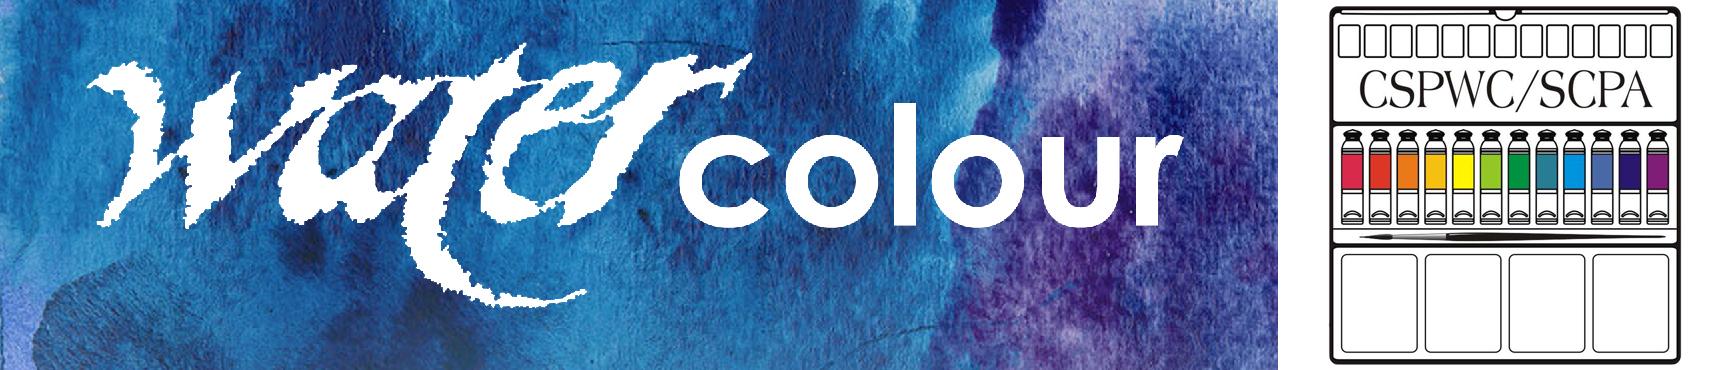 Water Colour Newsletter - Header